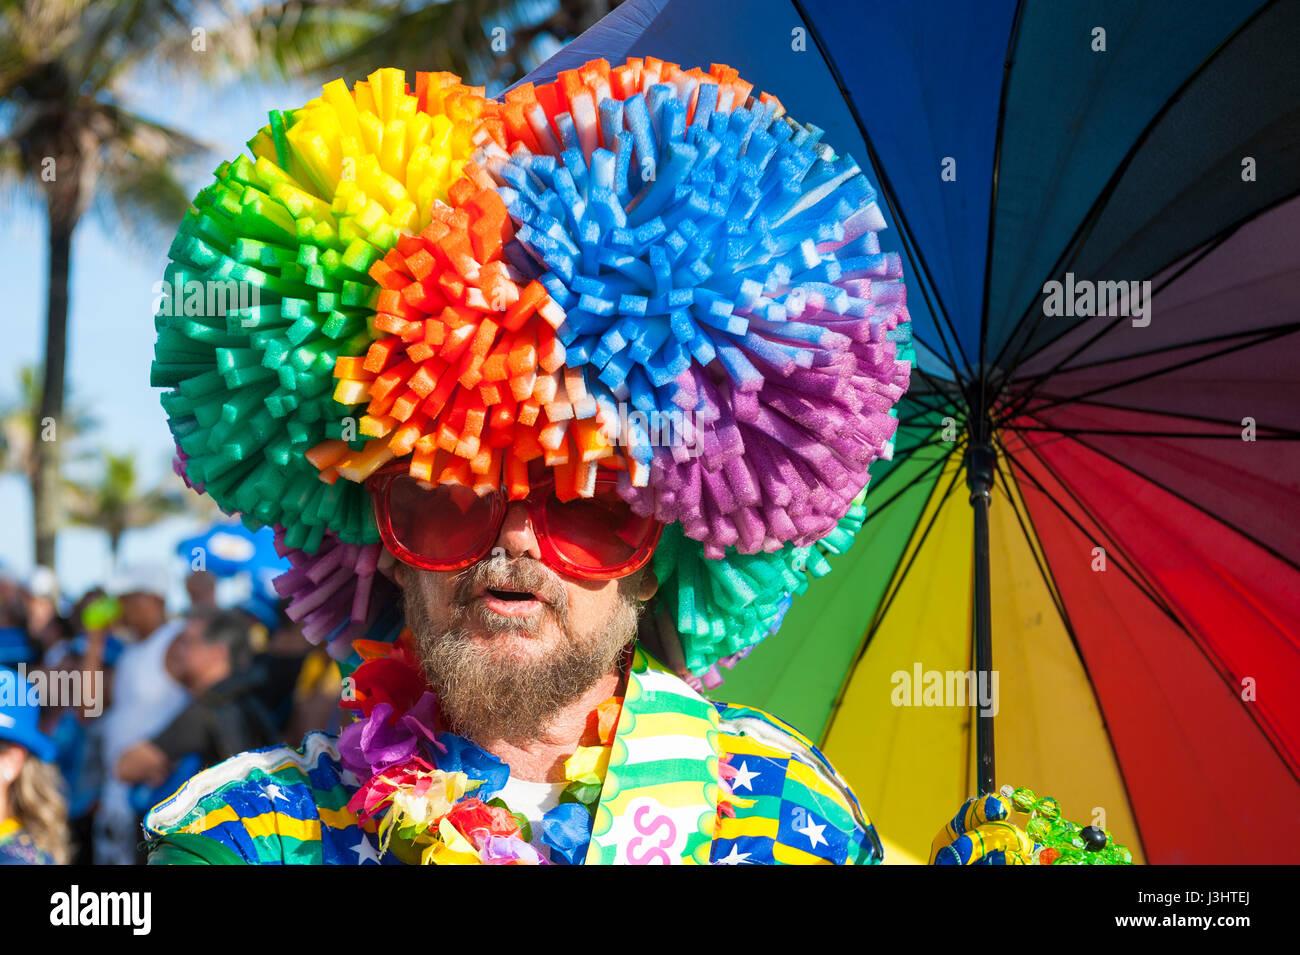 RIO DE JANEIRO - FEBRUARY 11, 2017: Brazilian man in flamboyant rainbow wig with matching umbrella celebrates carnival - Stock Image